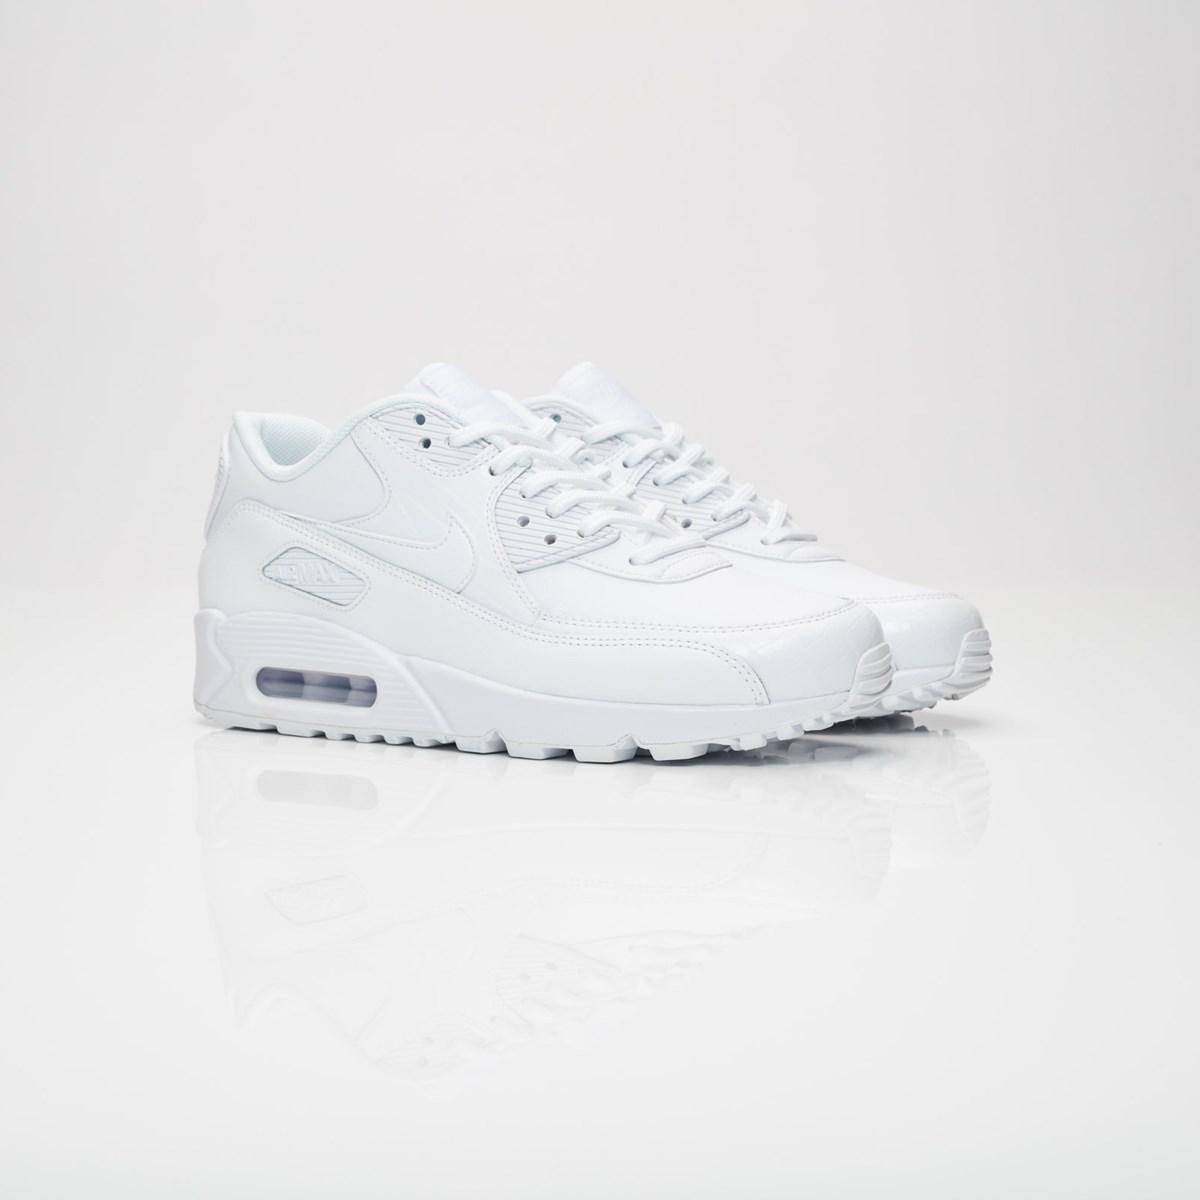 in stock 86413 00f14 nike wmns air max 90 325213 133 sneakers   streetwear på nätet sen 1999